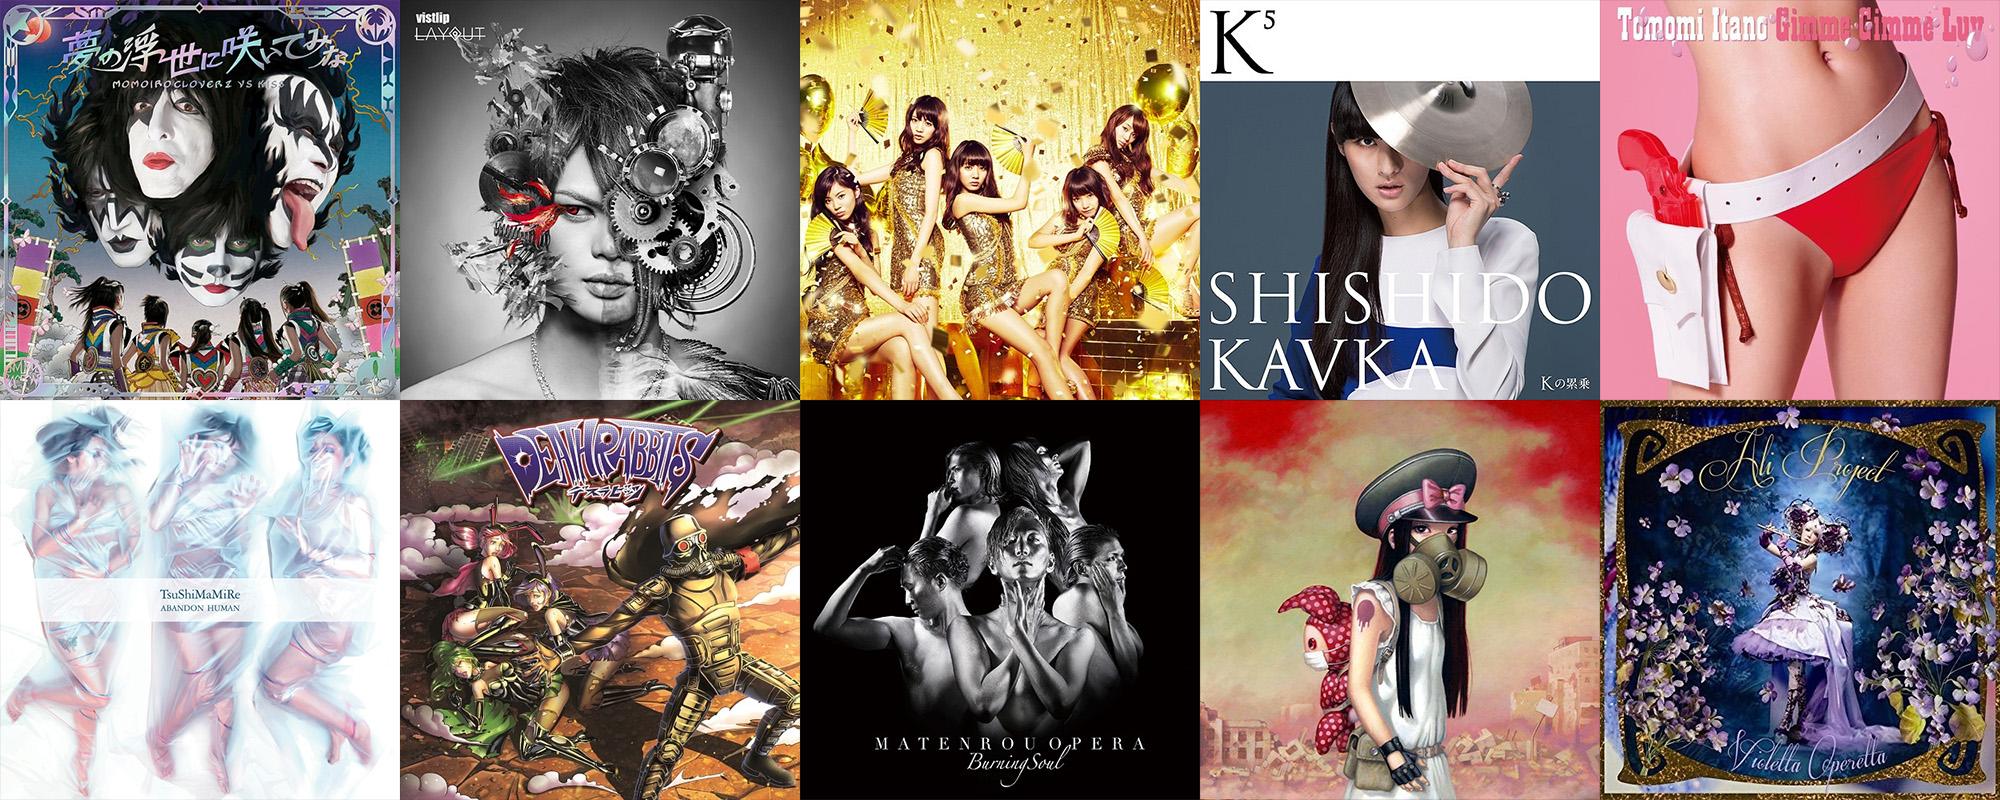 Best J-Pop J-Rock album covers 2015